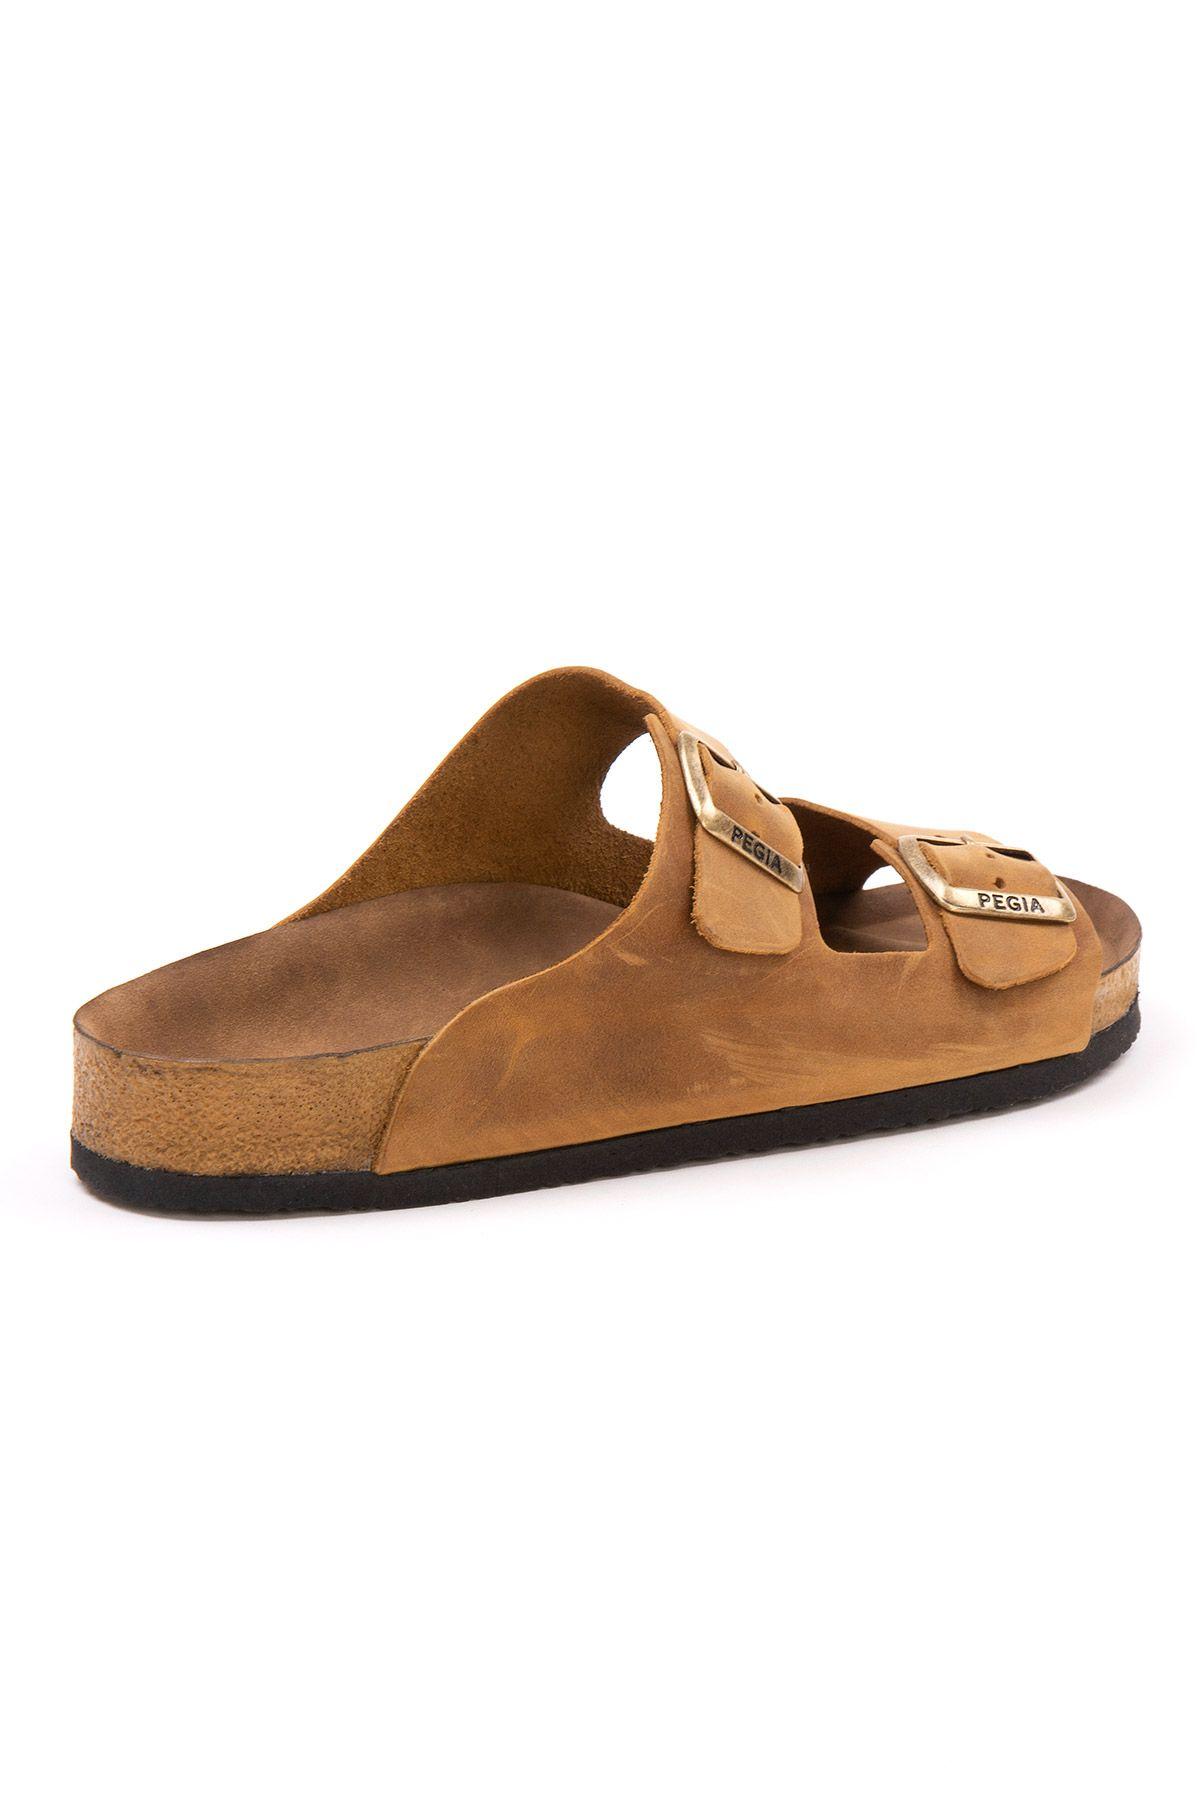 Pegia Men's Genuine Leather Slippers 215021 Ginger